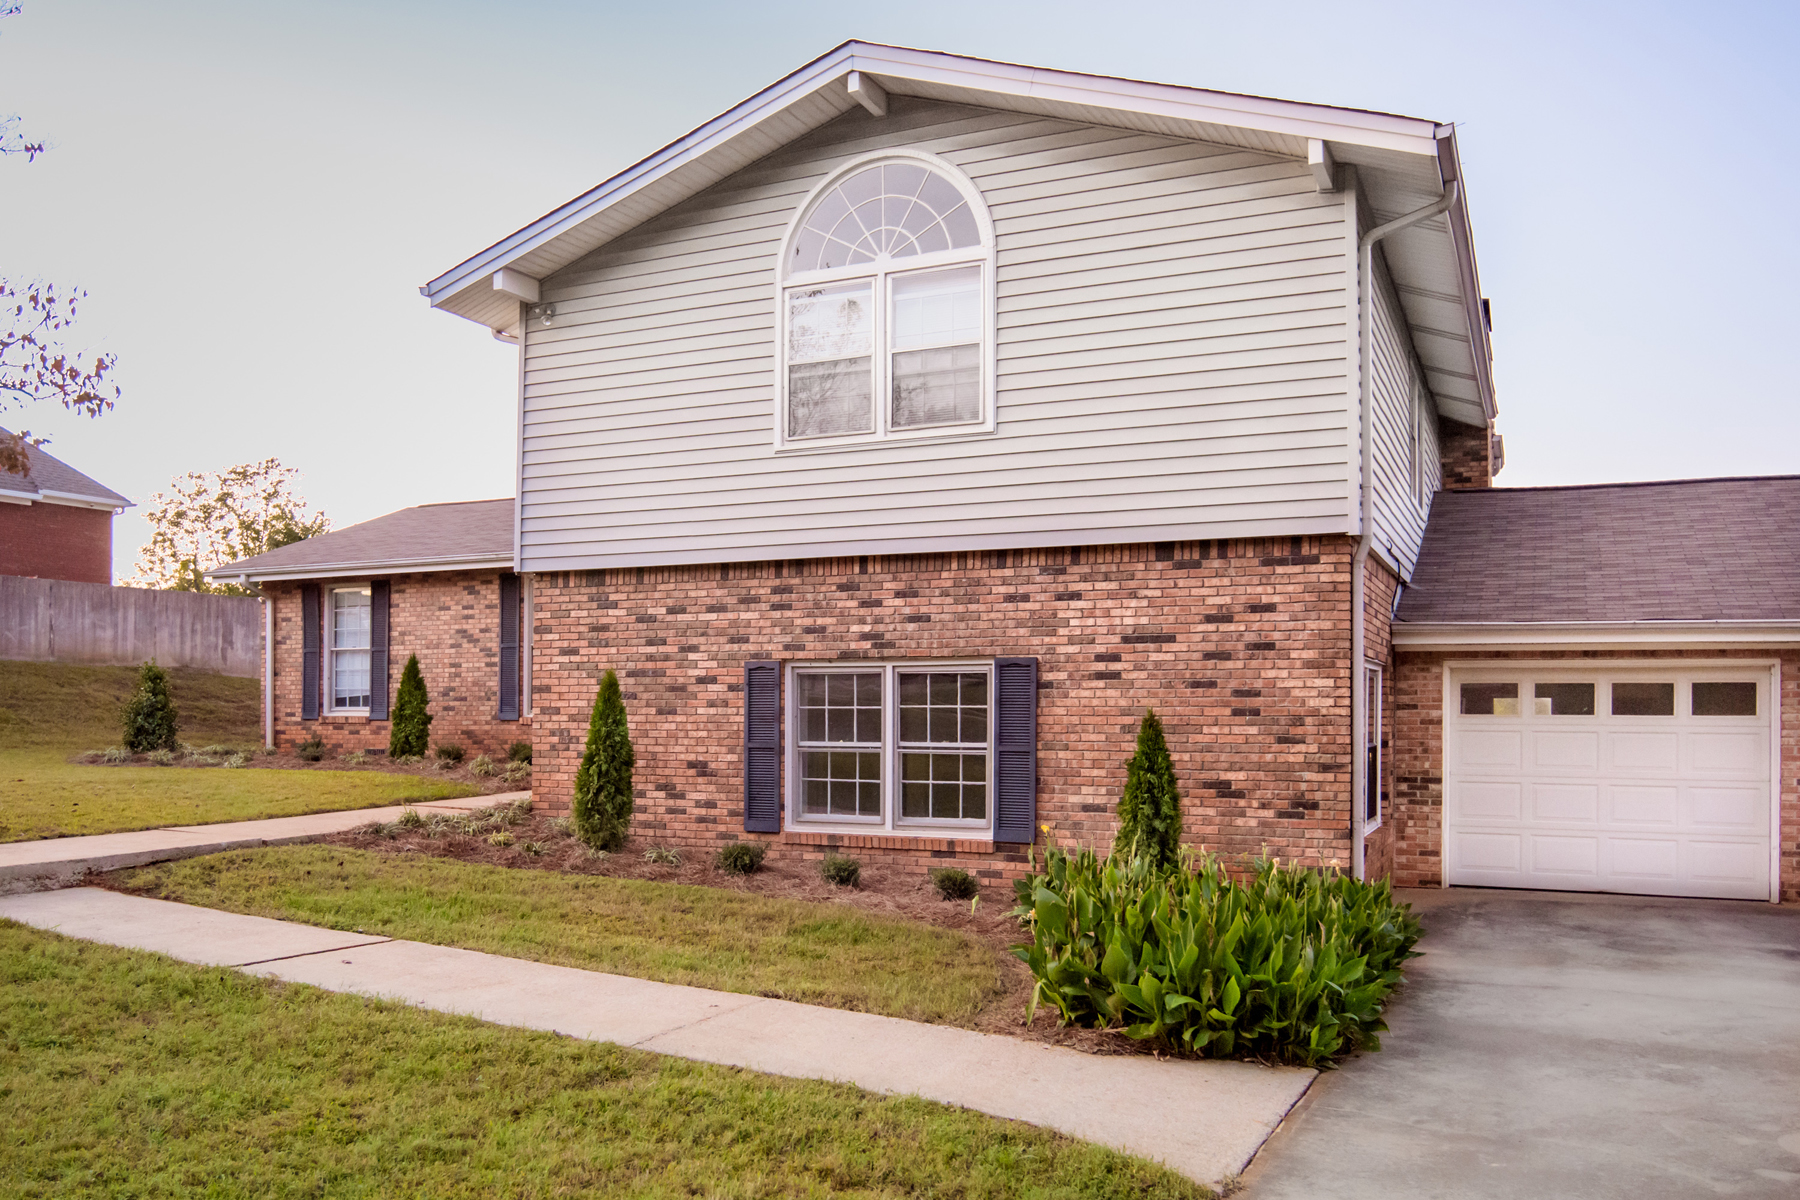 独户住宅 为 销售 在 Spacious Home On Nearly One Acre 179 Moores Drive, Dahlonega, 乔治亚州, 30533 美国